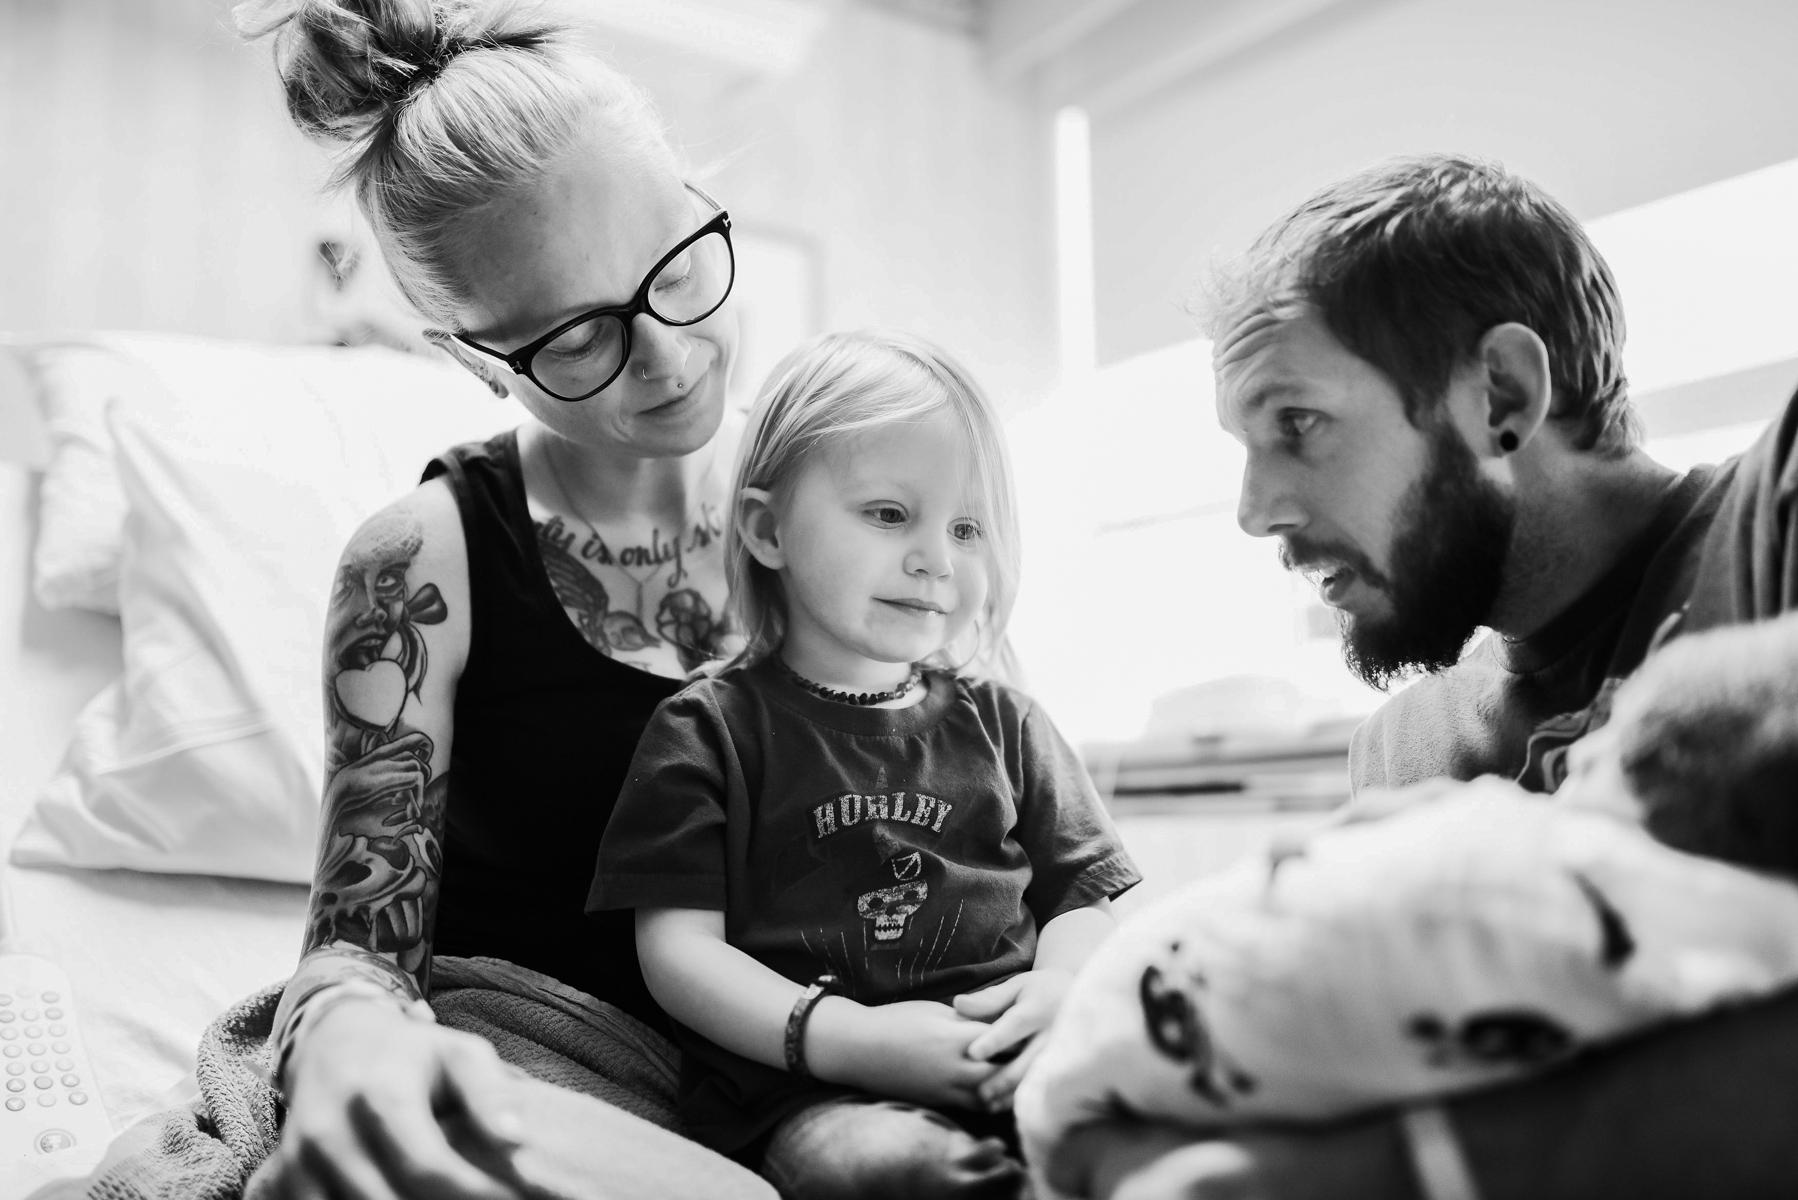 denver-birth-photographer-older-sibling-rose-birth